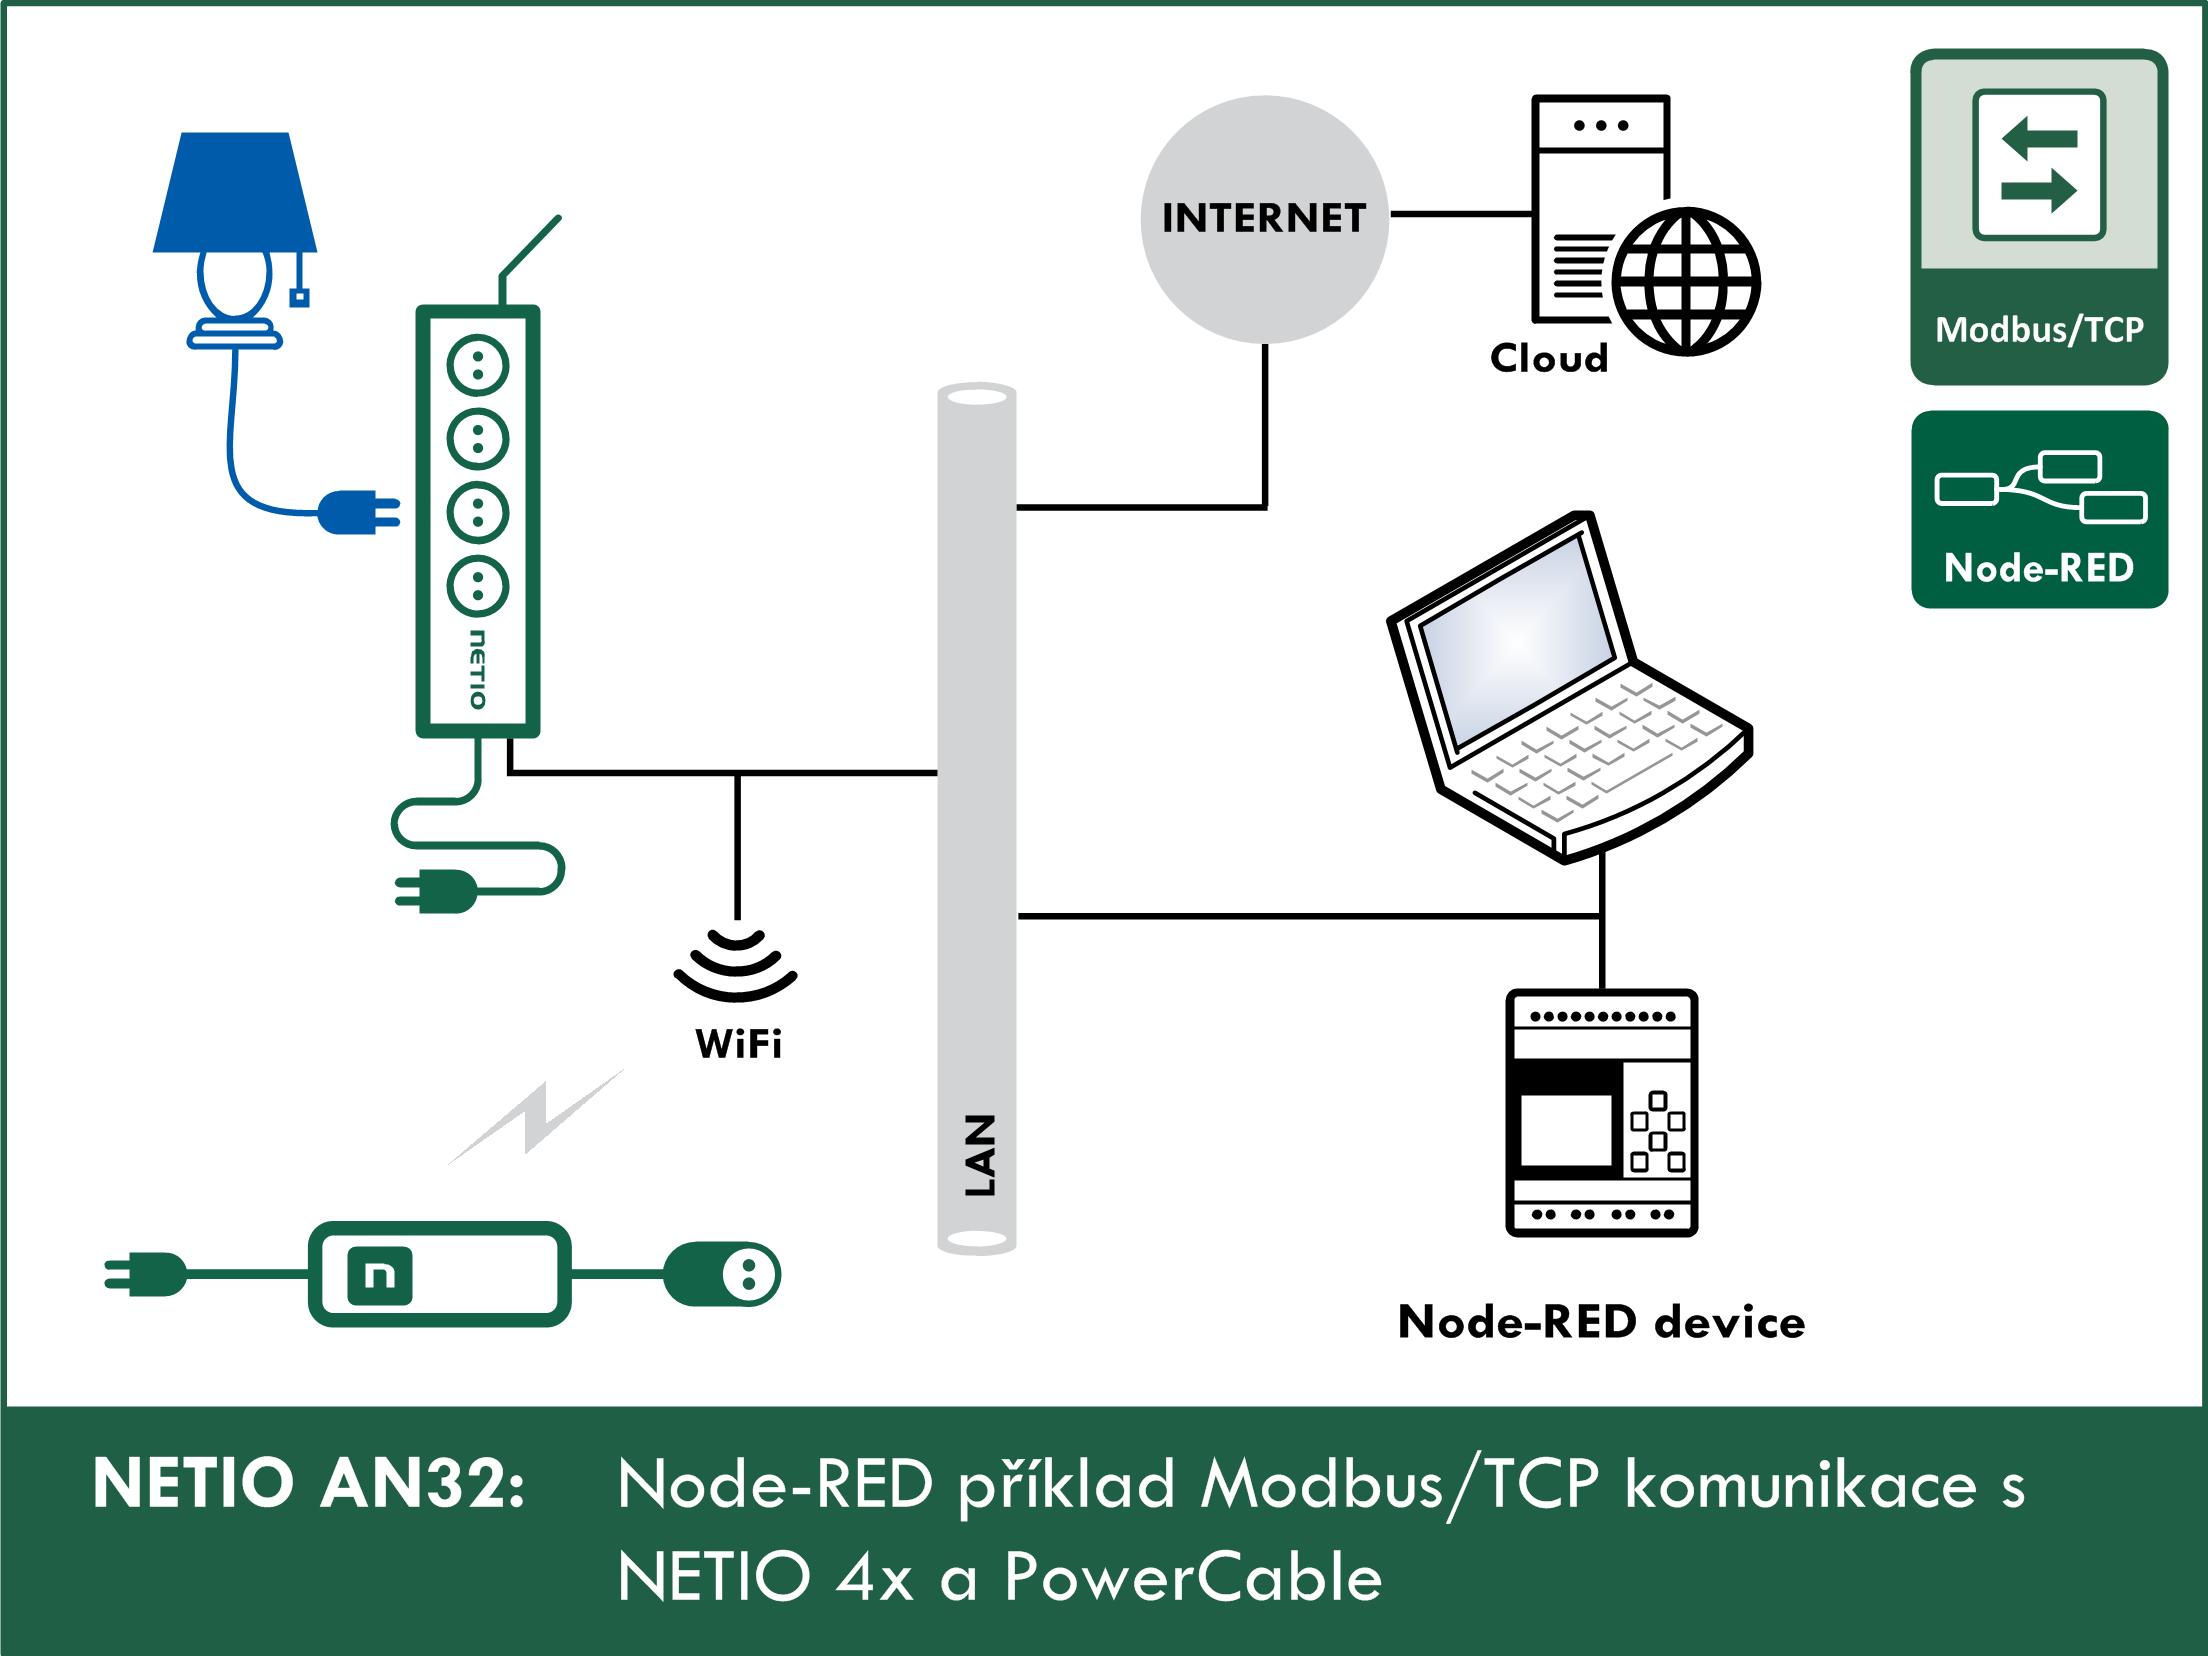 Node-RED příklad Modbus/TCP komunikace s NETIO 4x / PowerCable